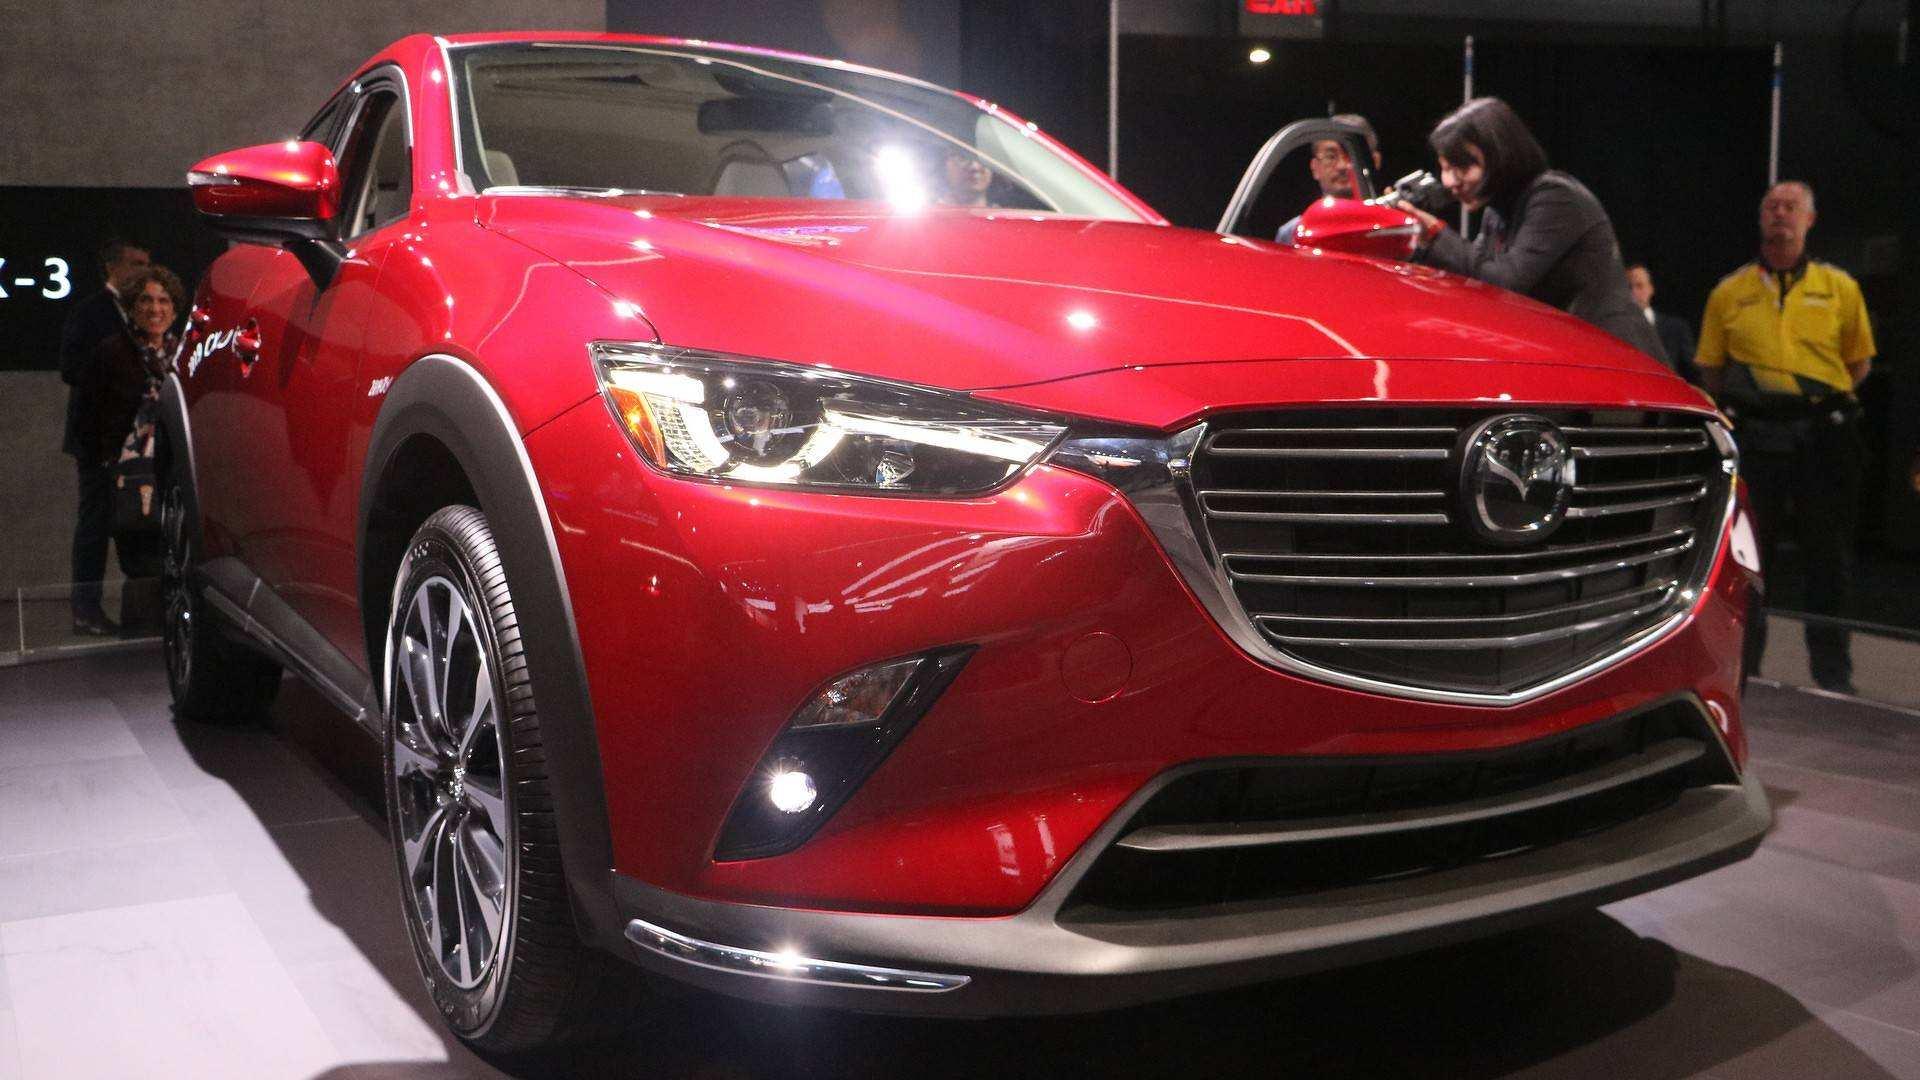 51 Gallery of Mazda Cx 3 2020 Grey Exterior for Mazda Cx 3 2020 Grey